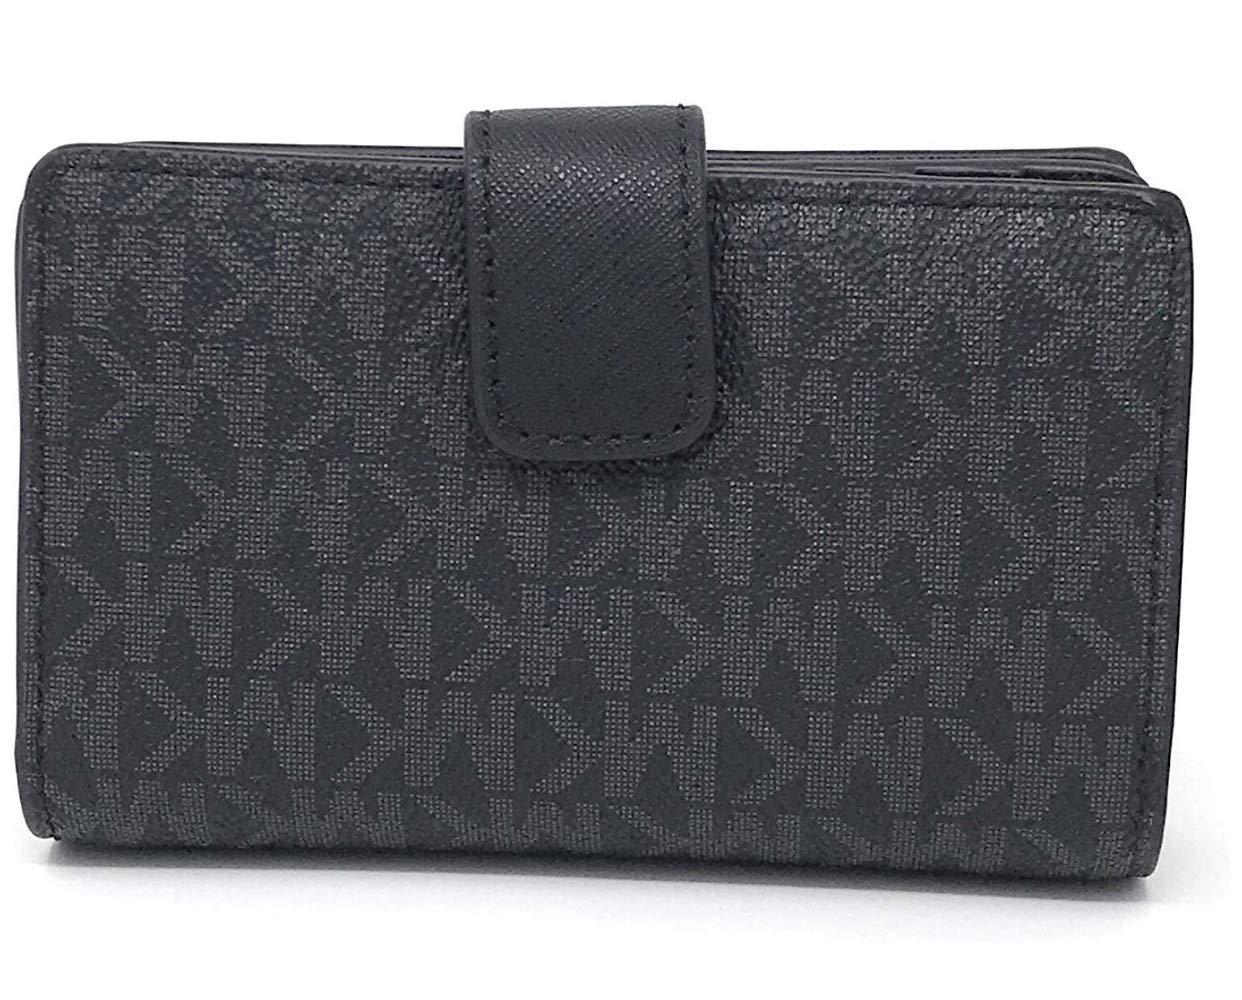 Michael Kors Jet Set Travel Saffiano Leather Bifold Zip Coin Wallet (Black PVC 2019) by Michael Kors (Image #2)